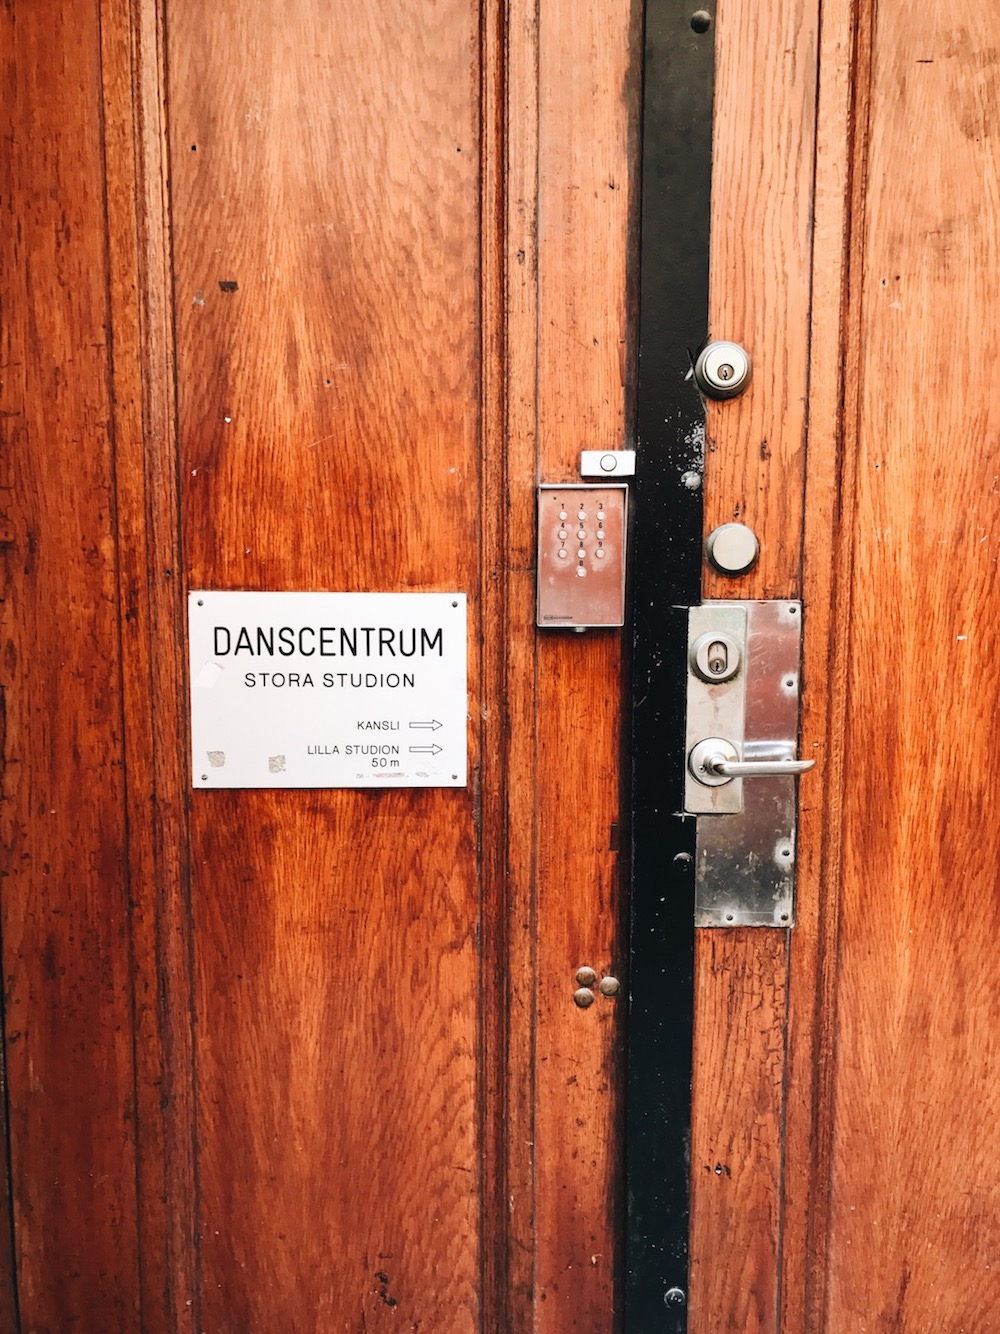 Dancecentrum | Snapshots from Stockholm | Ruby Josephine